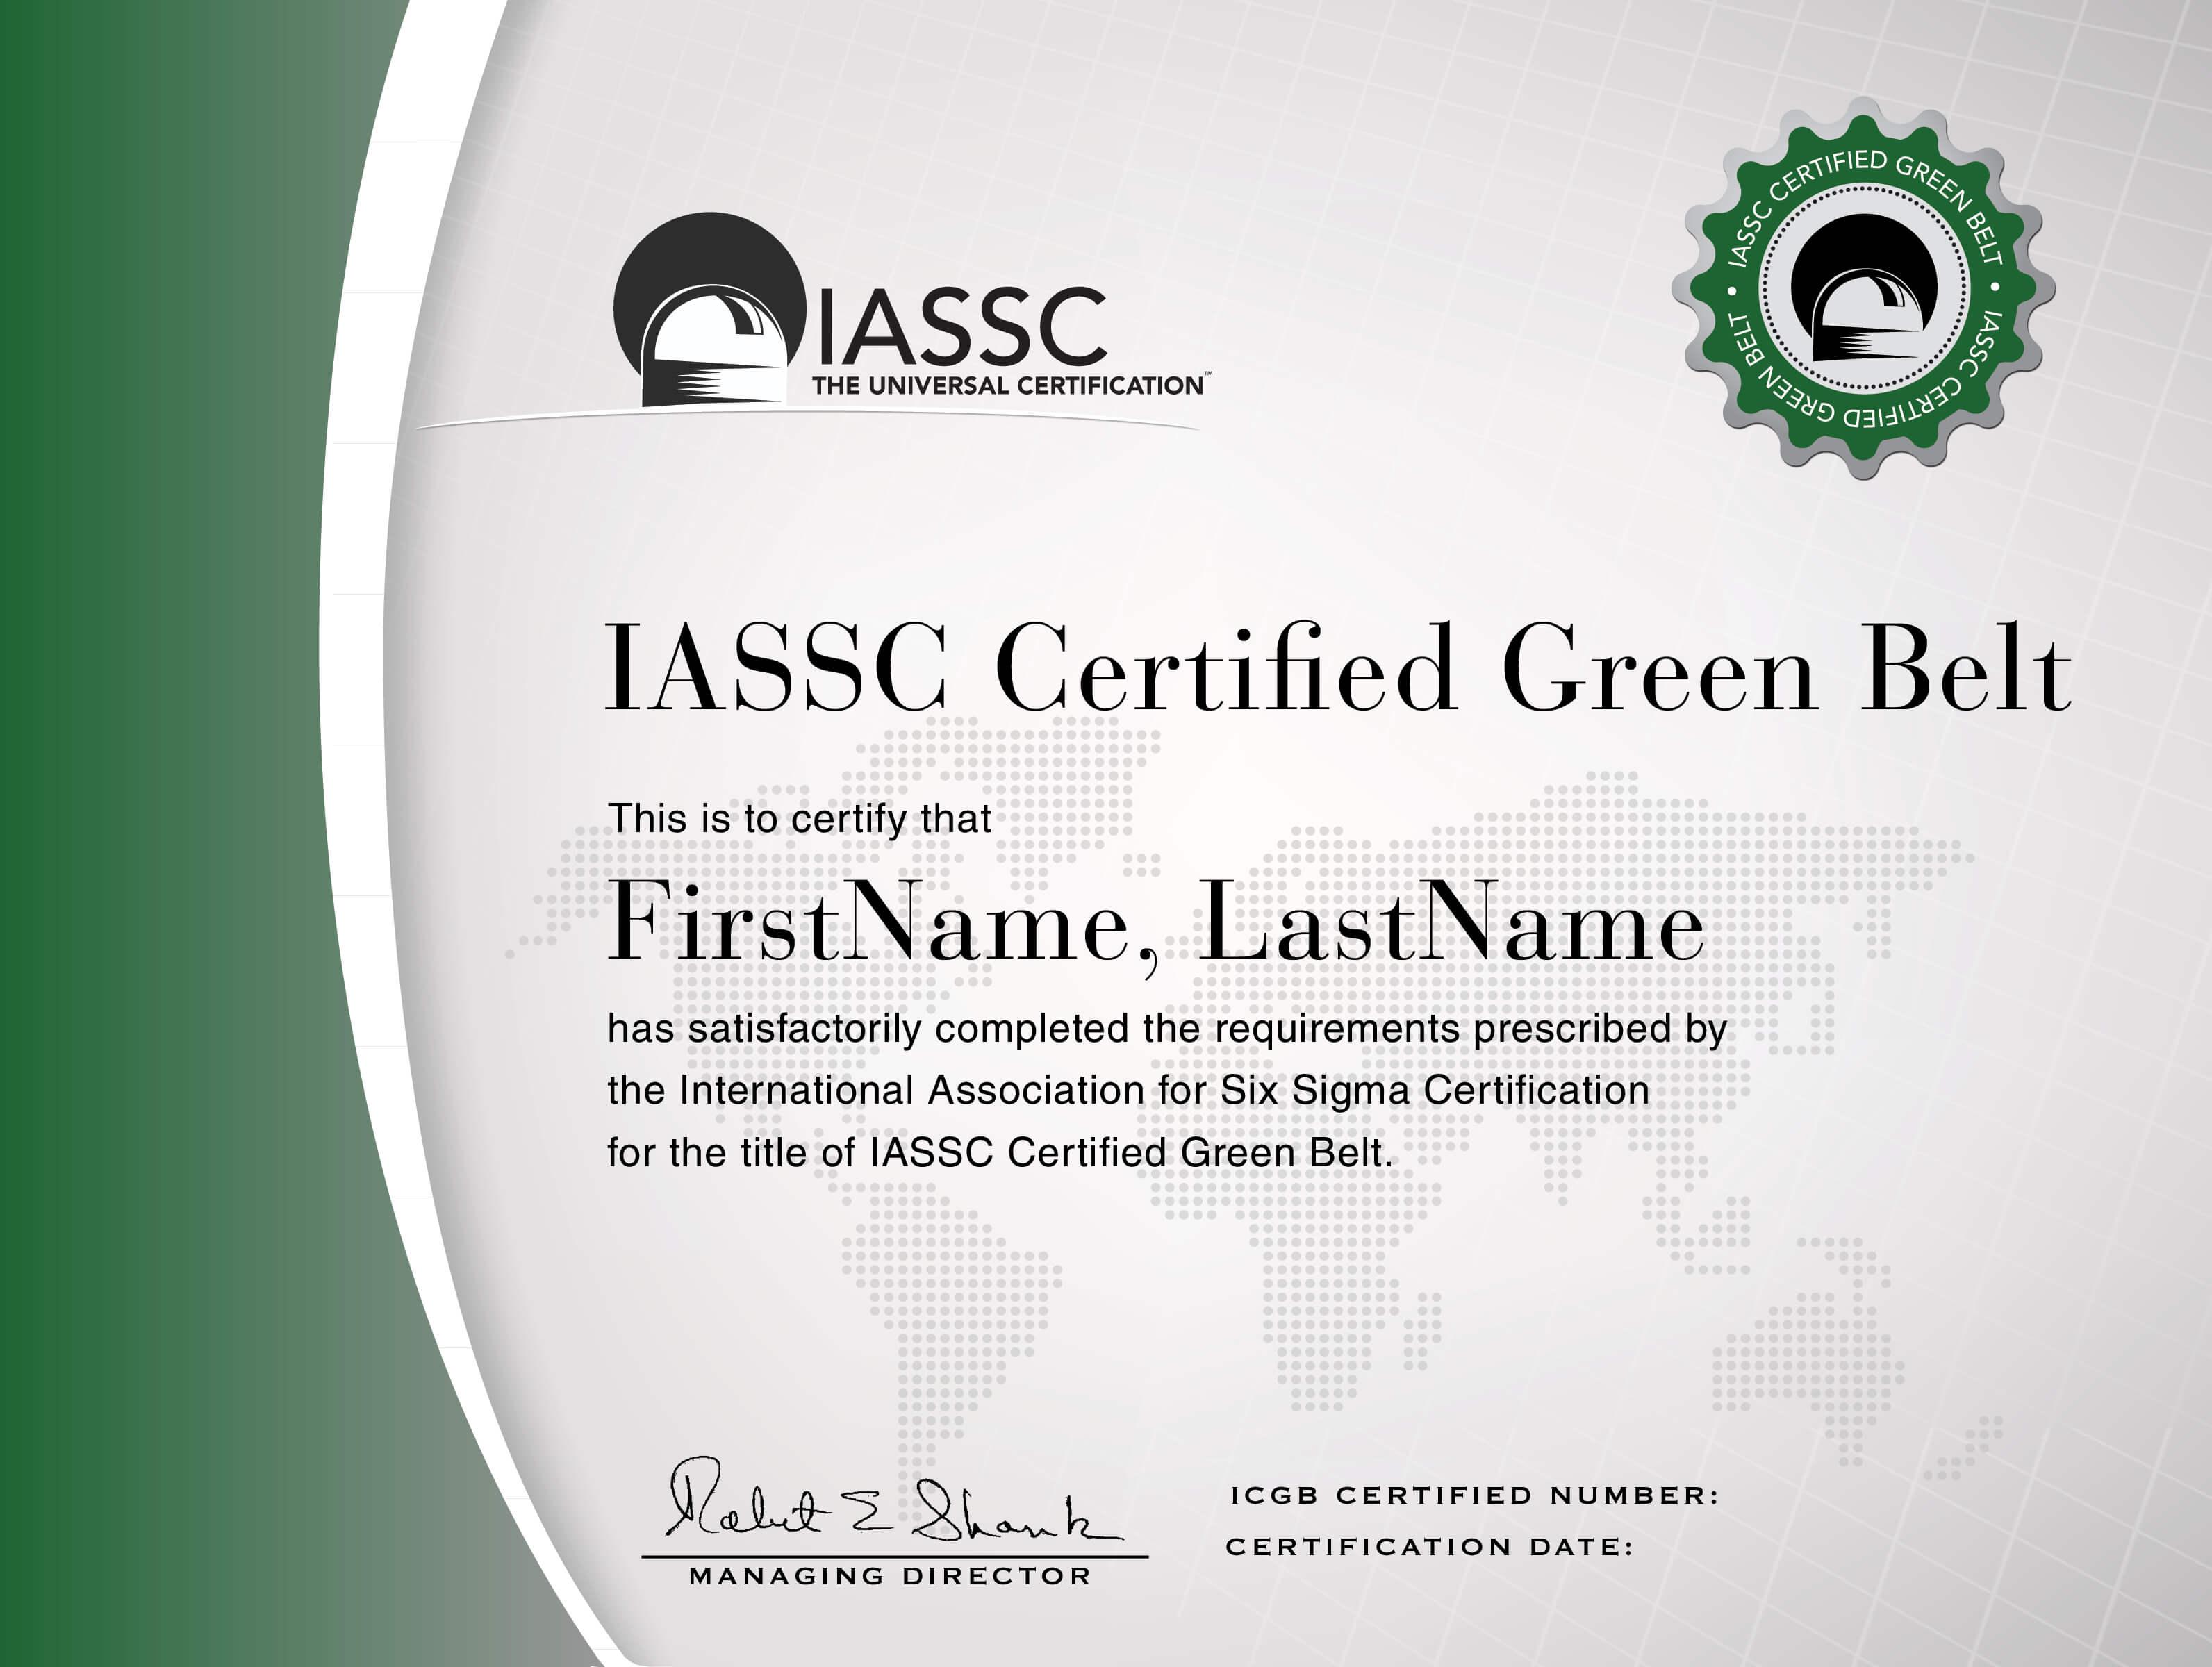 Green Belt Certification | Lean Six Sigma, Six Sigma Tools Throughout Green Belt Certificate Template